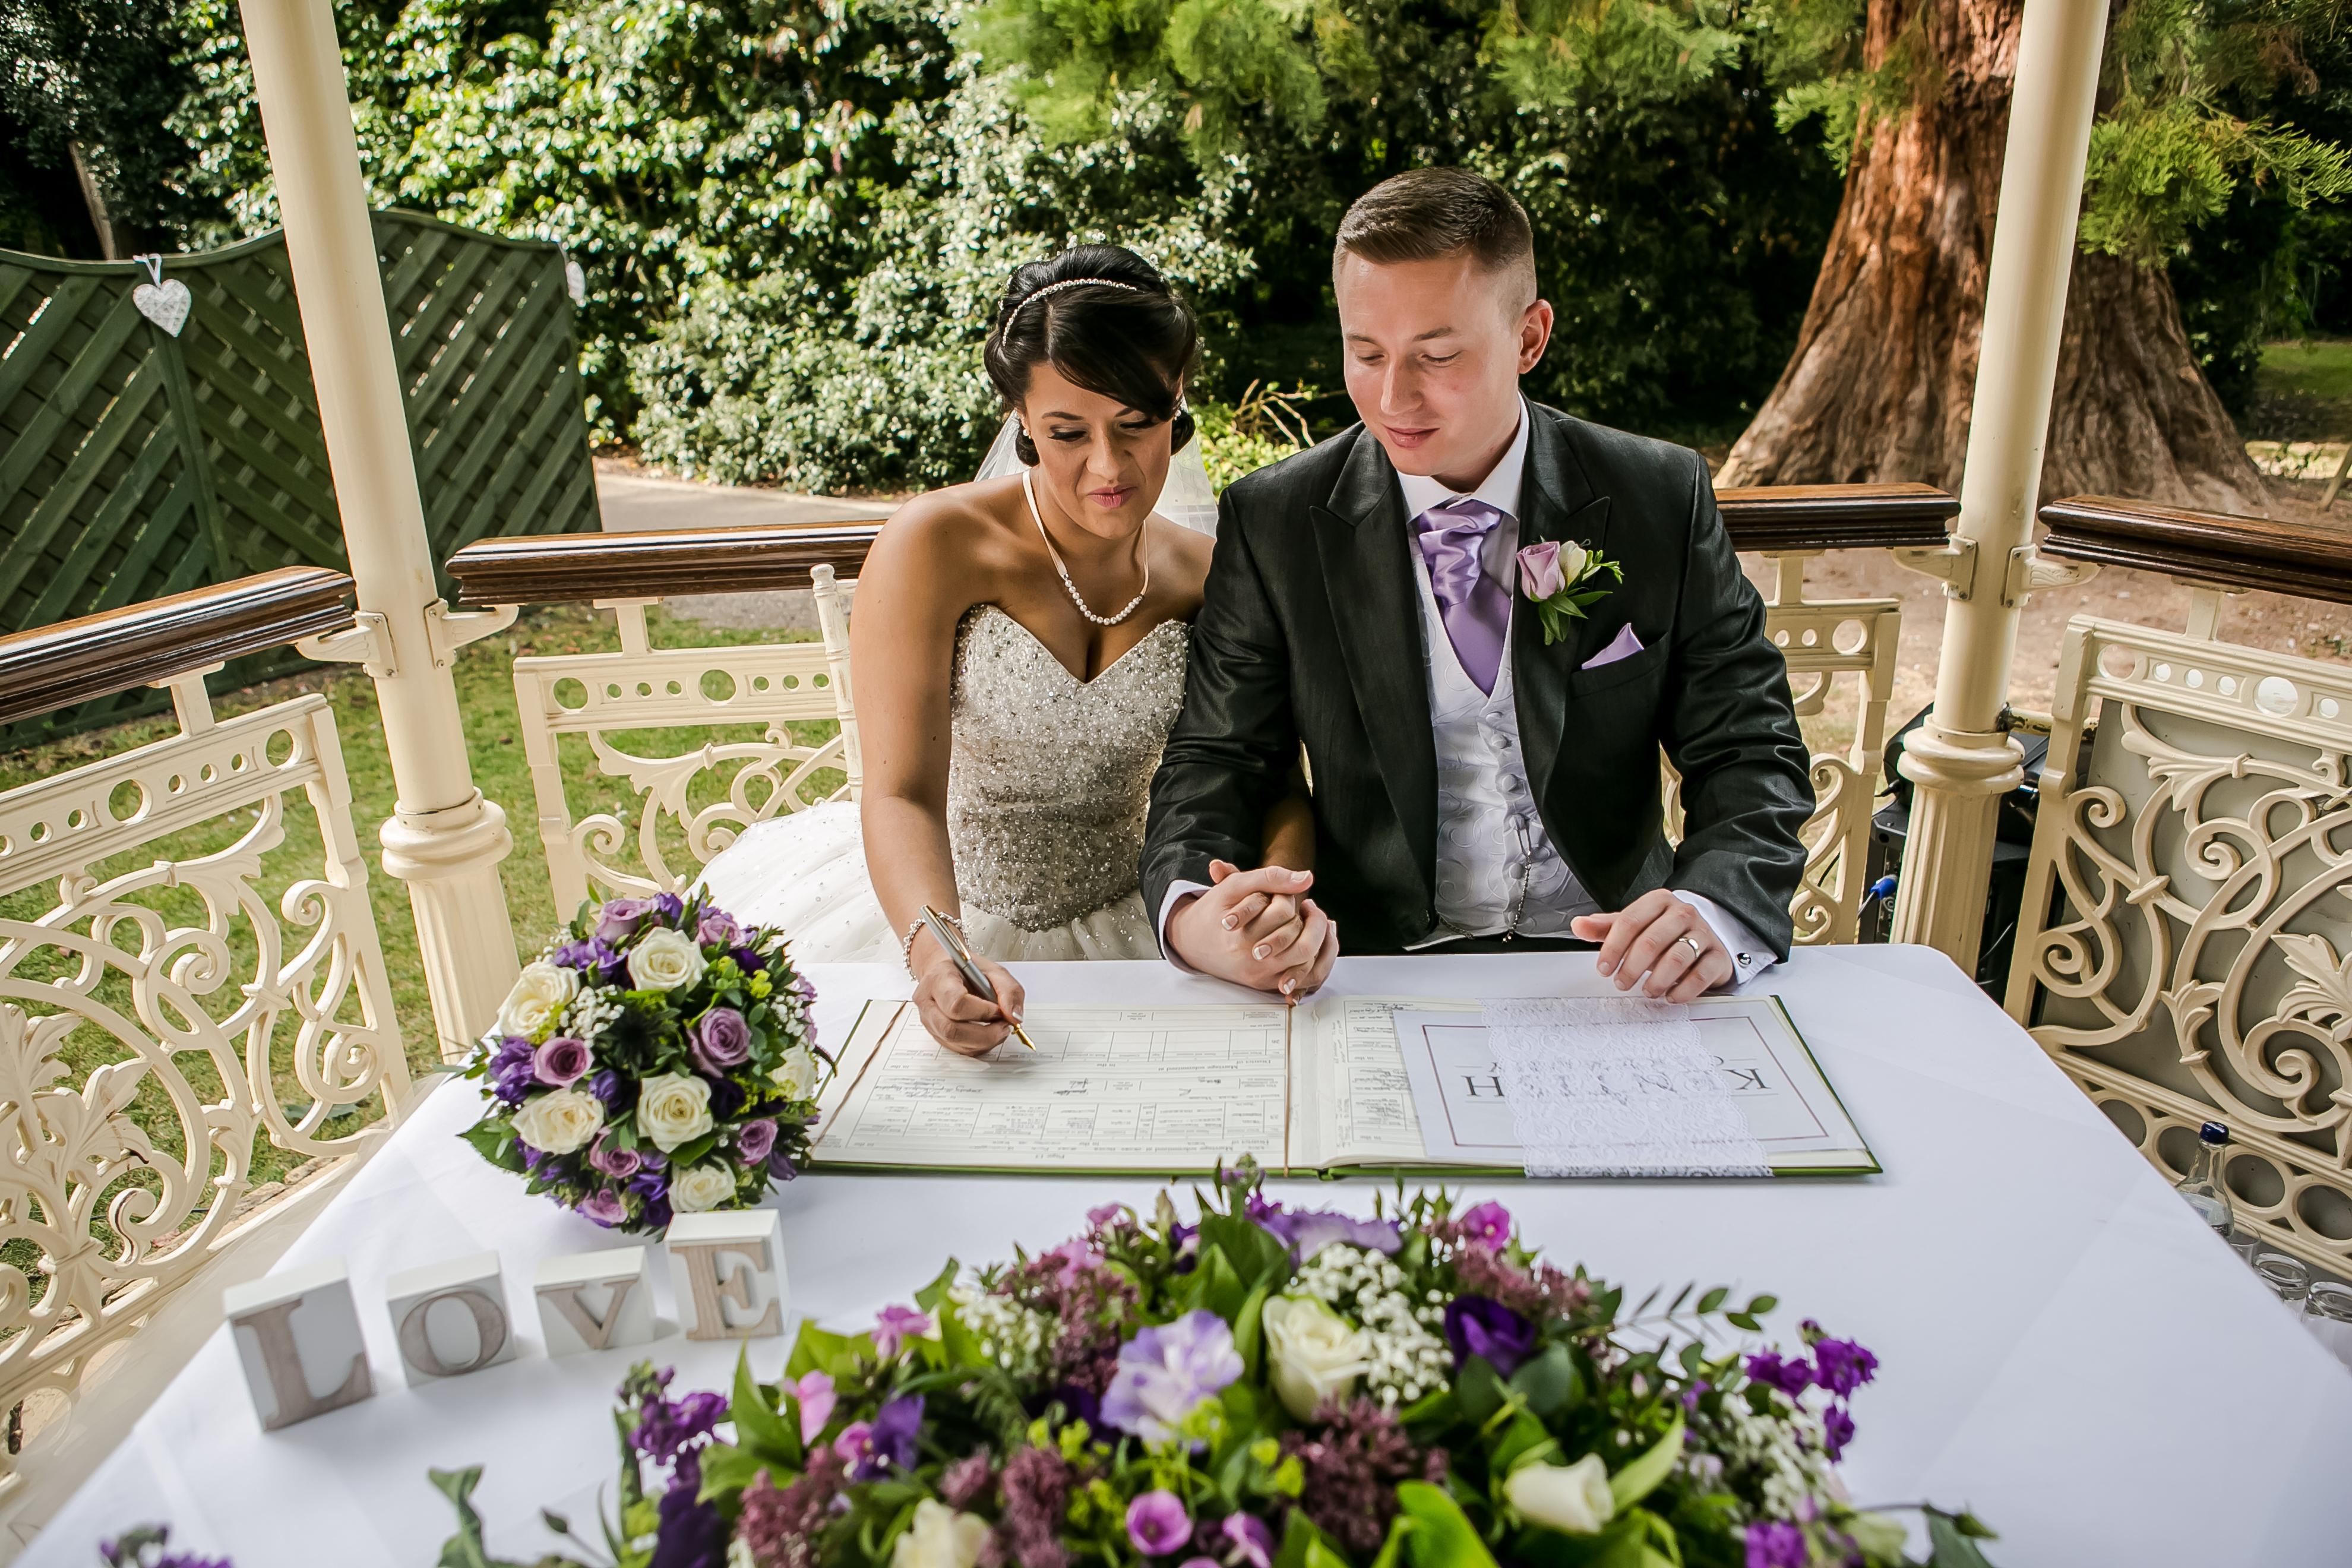 Shanice's Wedding